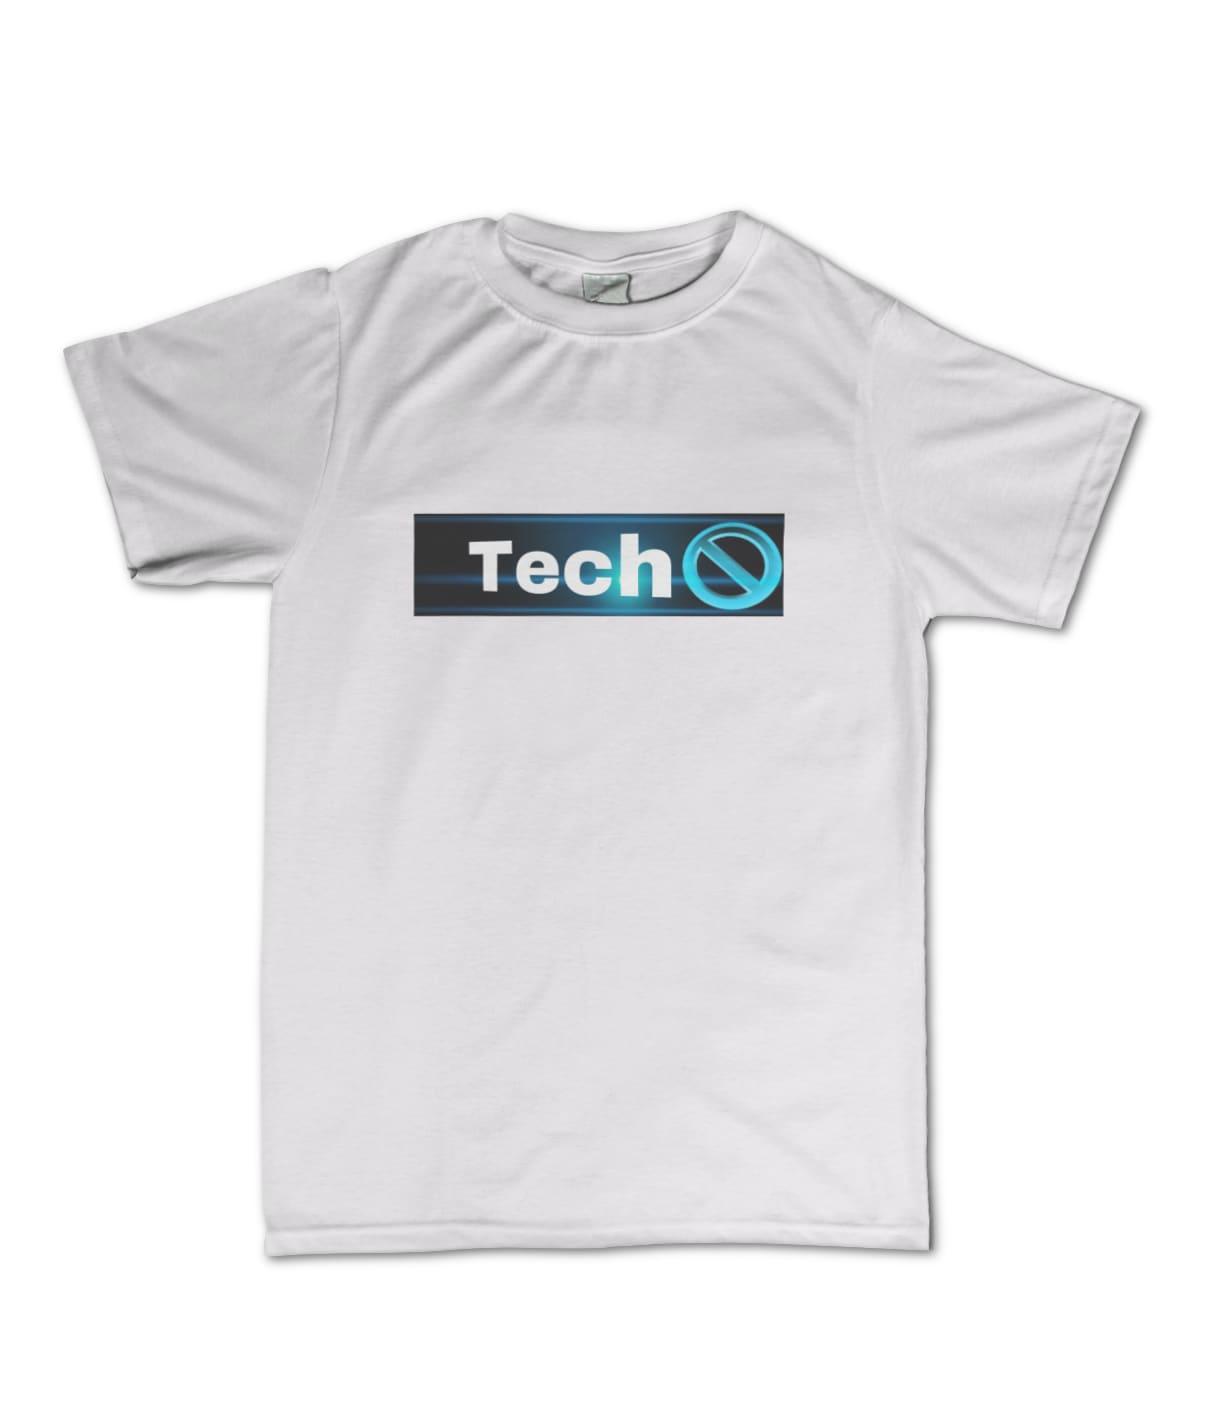 Techno techno 1545258089